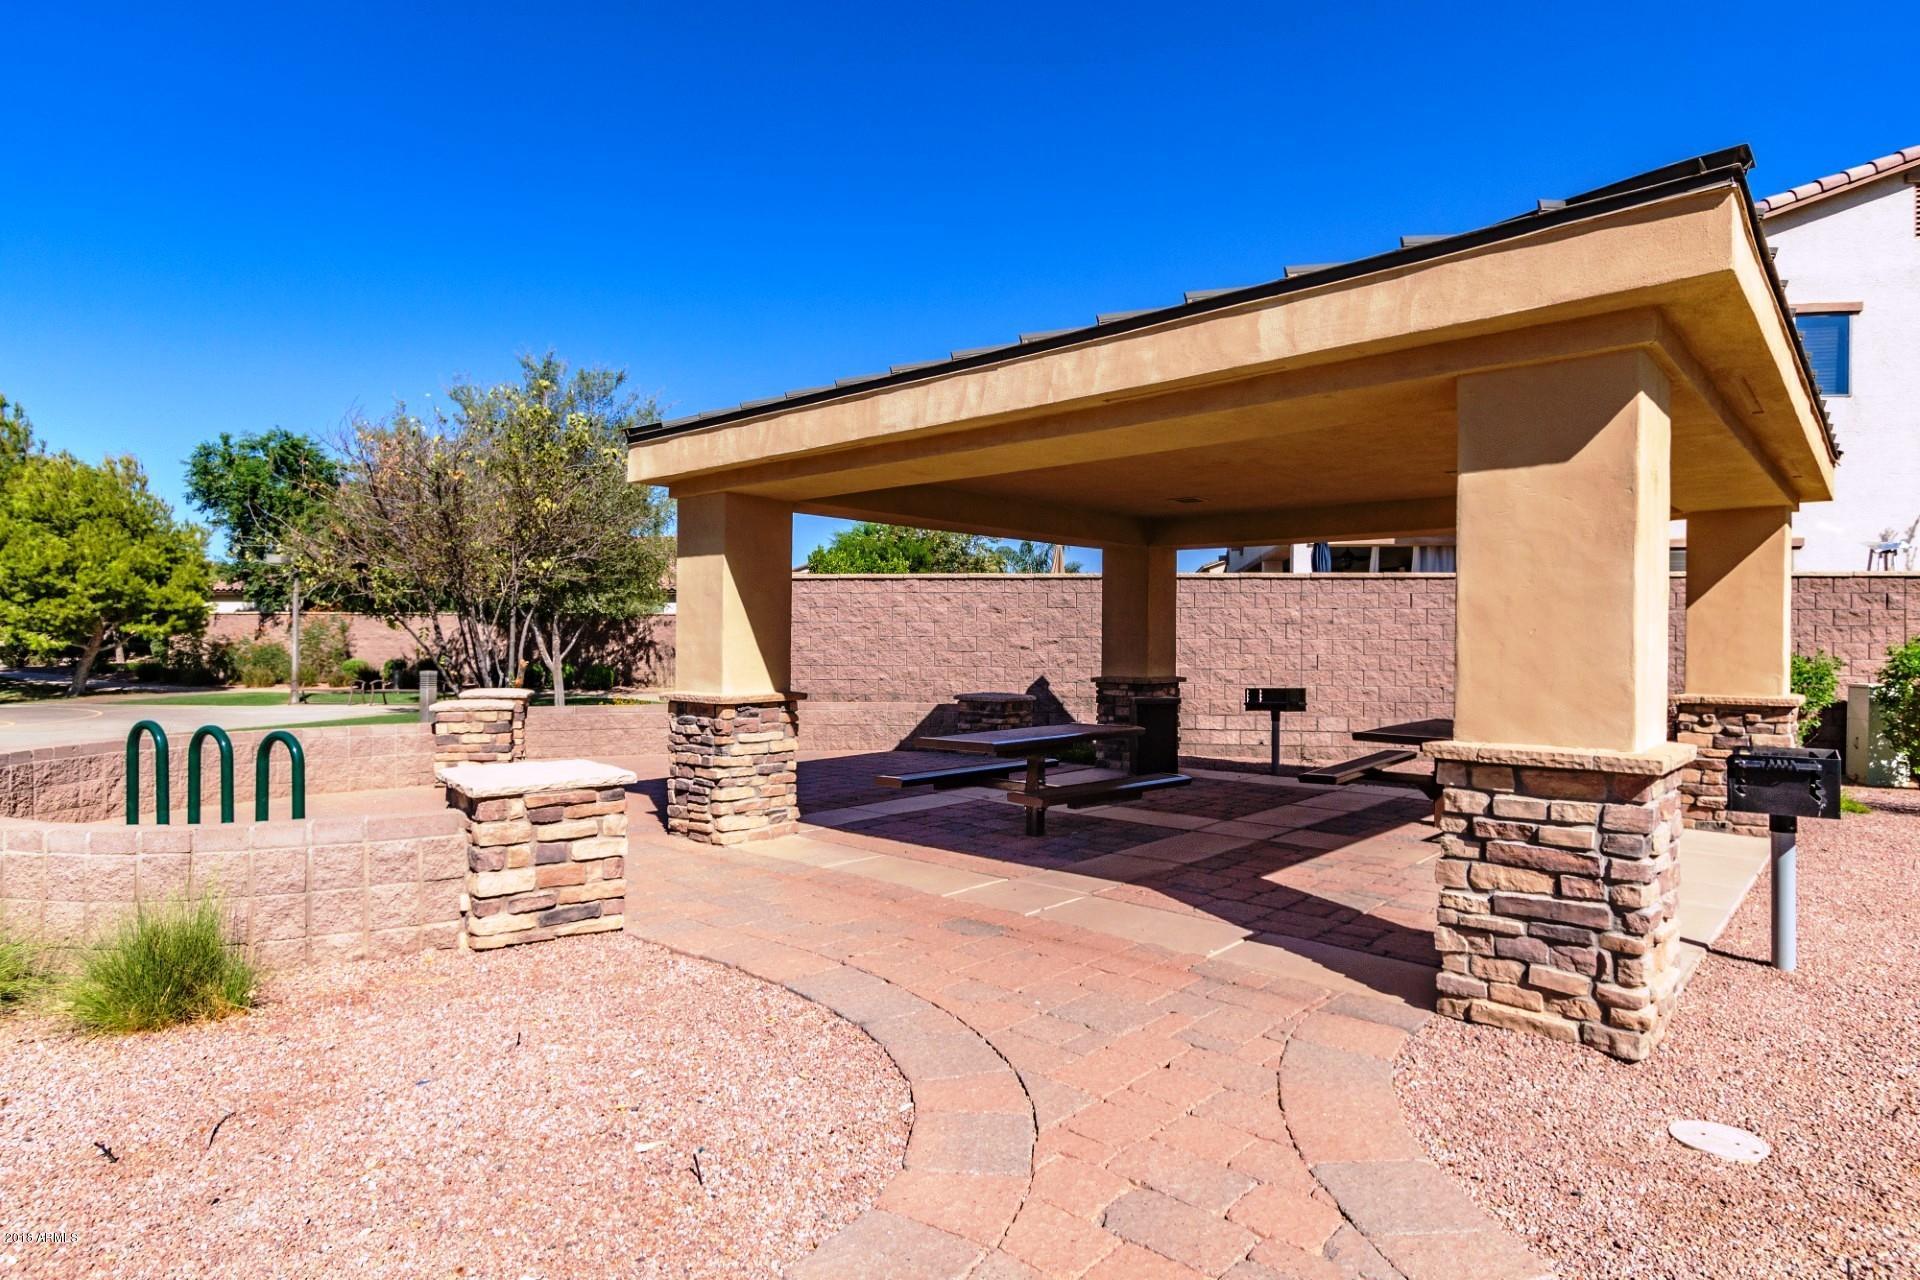 MLS 5820090 2603 E DONATO Drive, Gilbert, AZ 85298 Freeman Farms